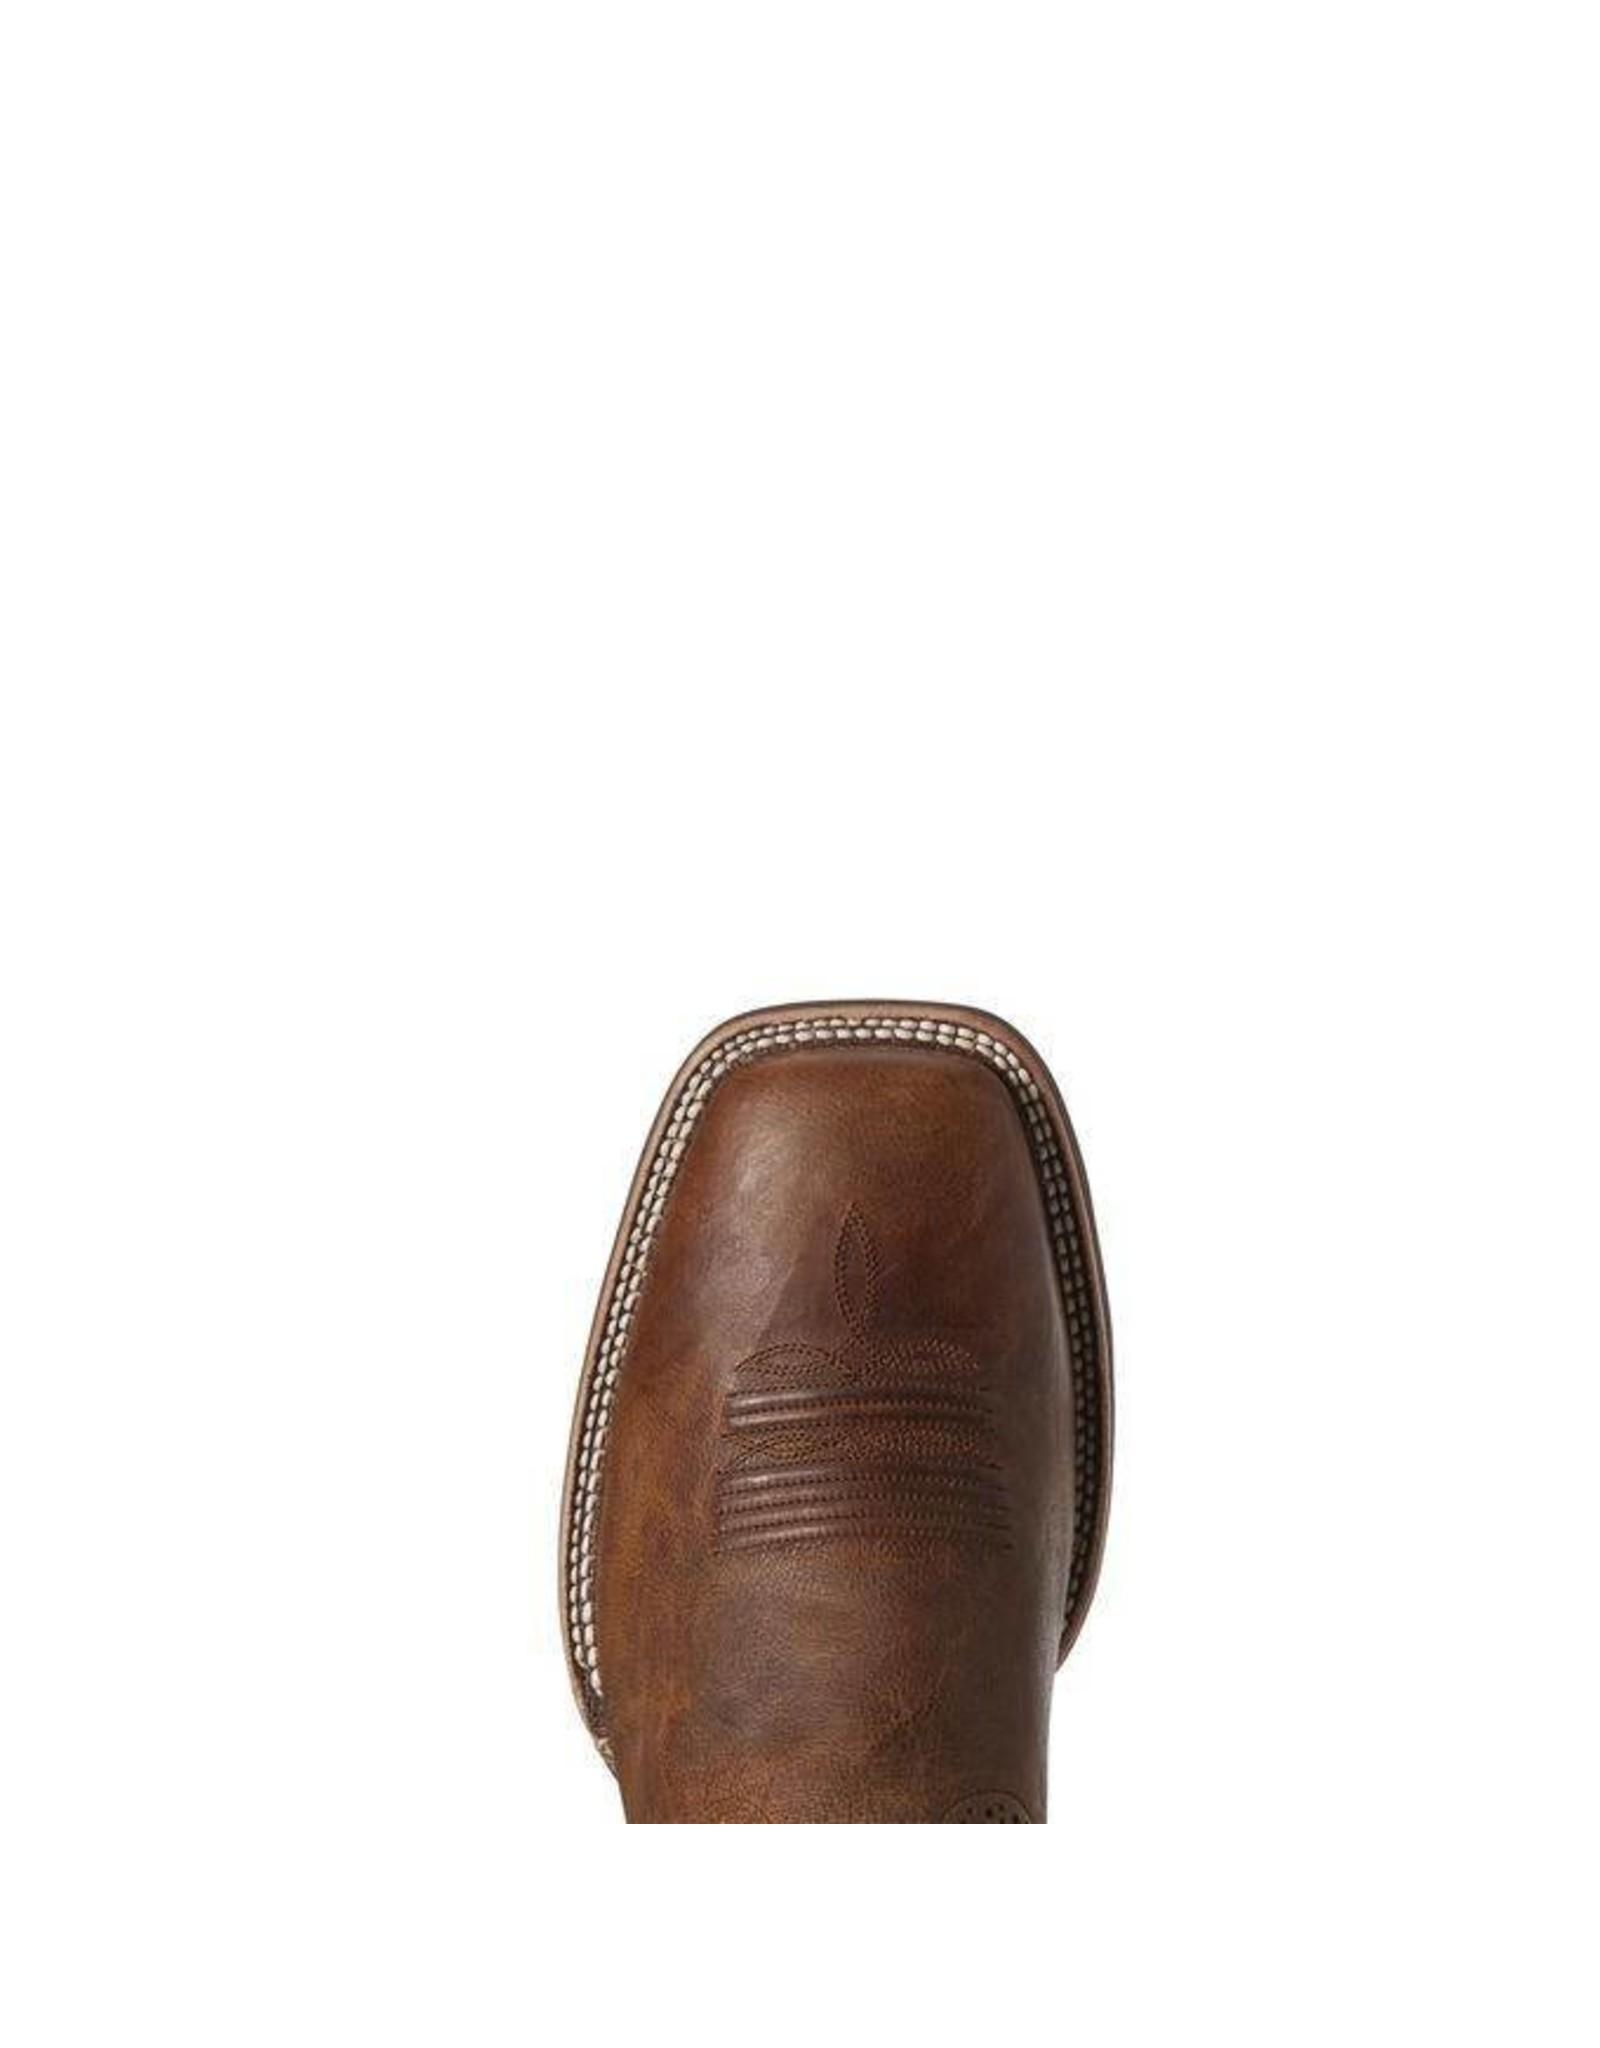 Boots-Men Ariat 10027161 Tycon Sorel Crunch